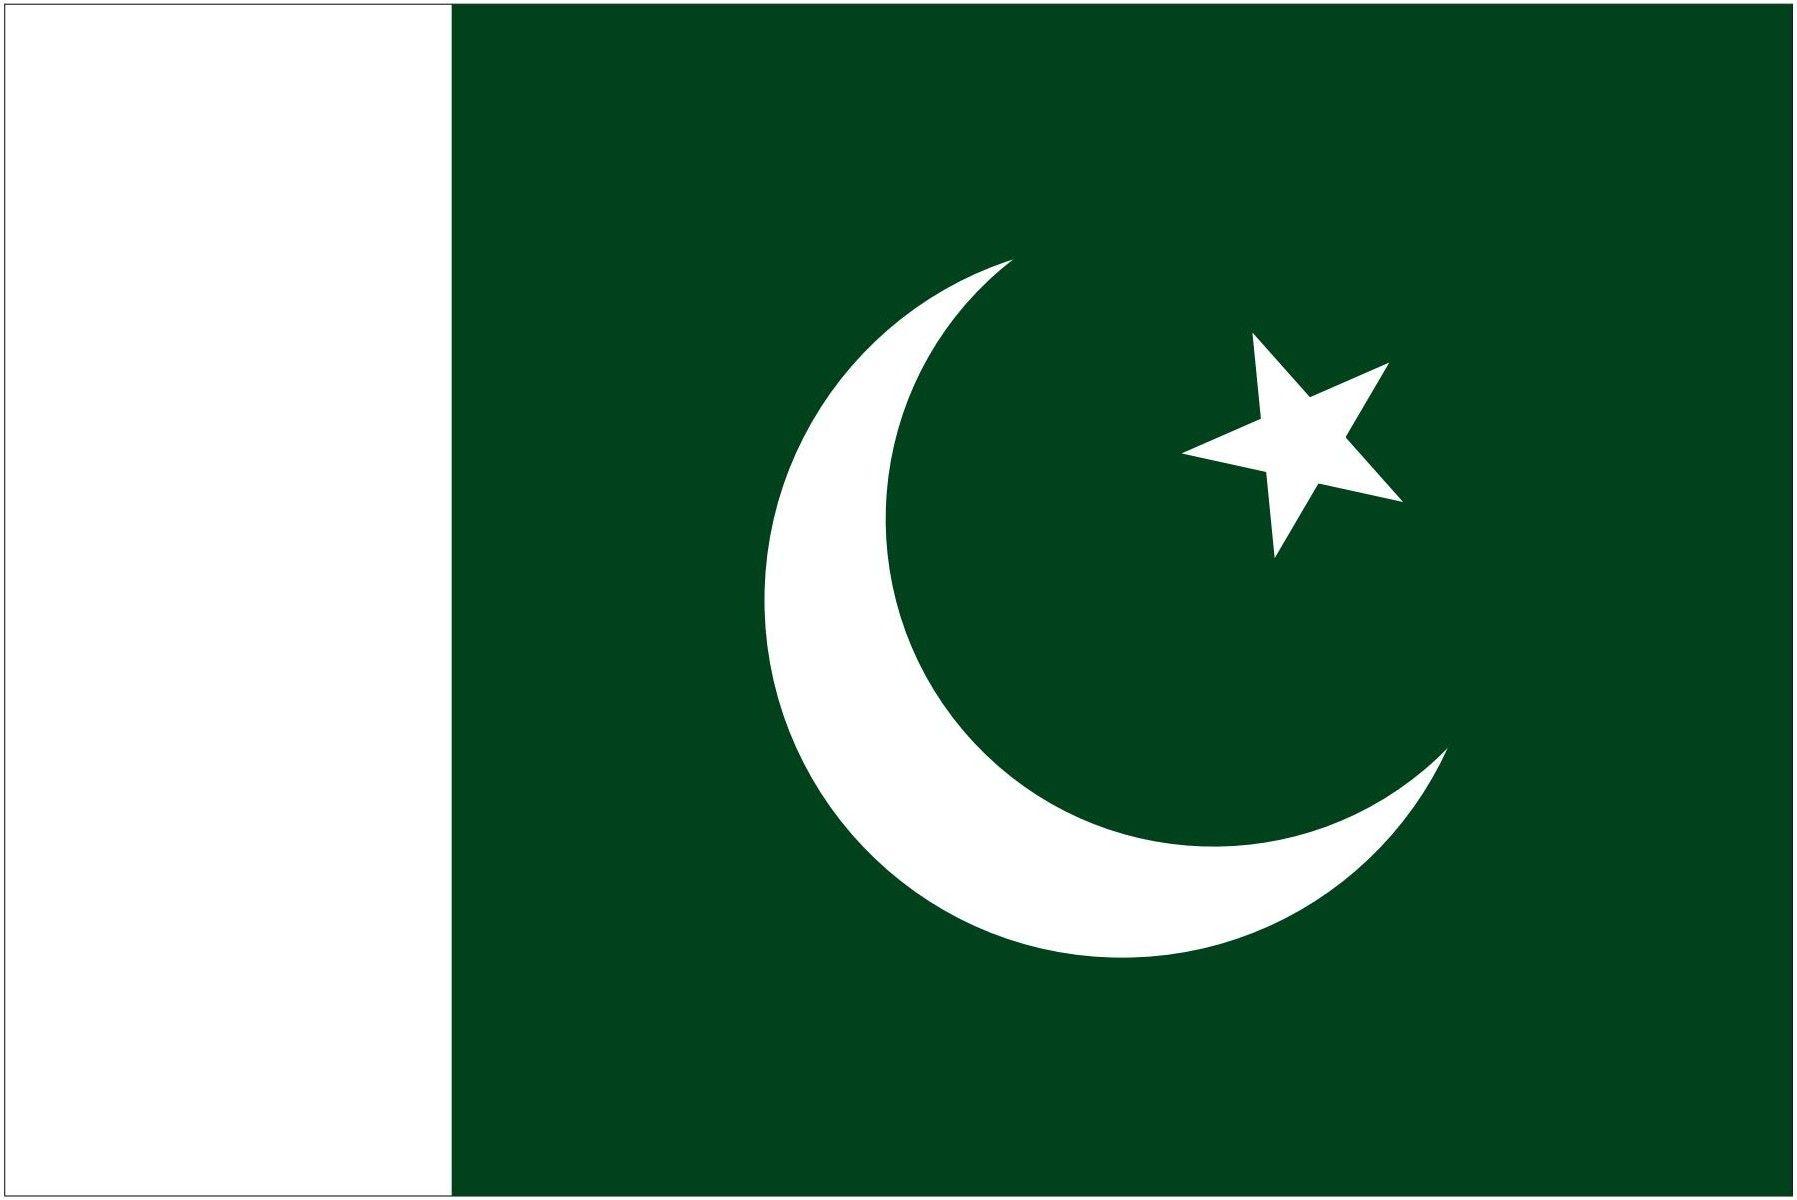 Pakistan Logo And Emblem Pakistani Pakistan Flag Pakistani Flag Flags Of The World